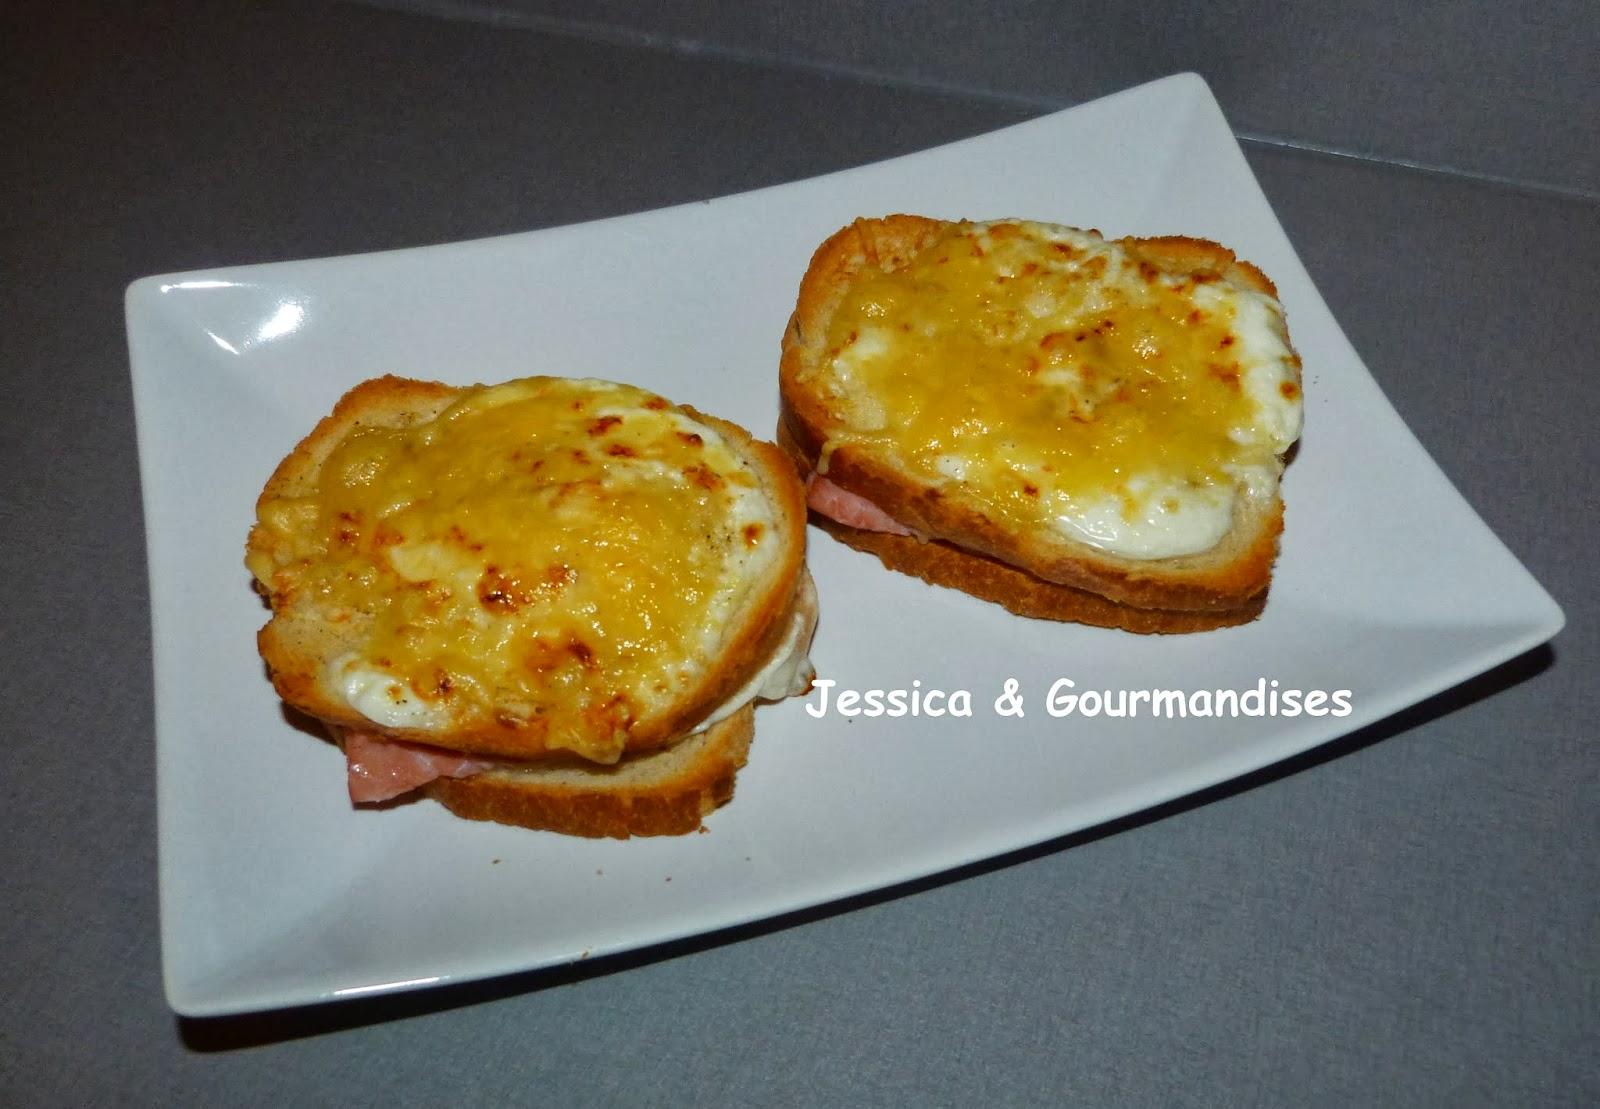 Jessica gourmandises croque monsieur au four - Croque monsieur au four bechamel ...